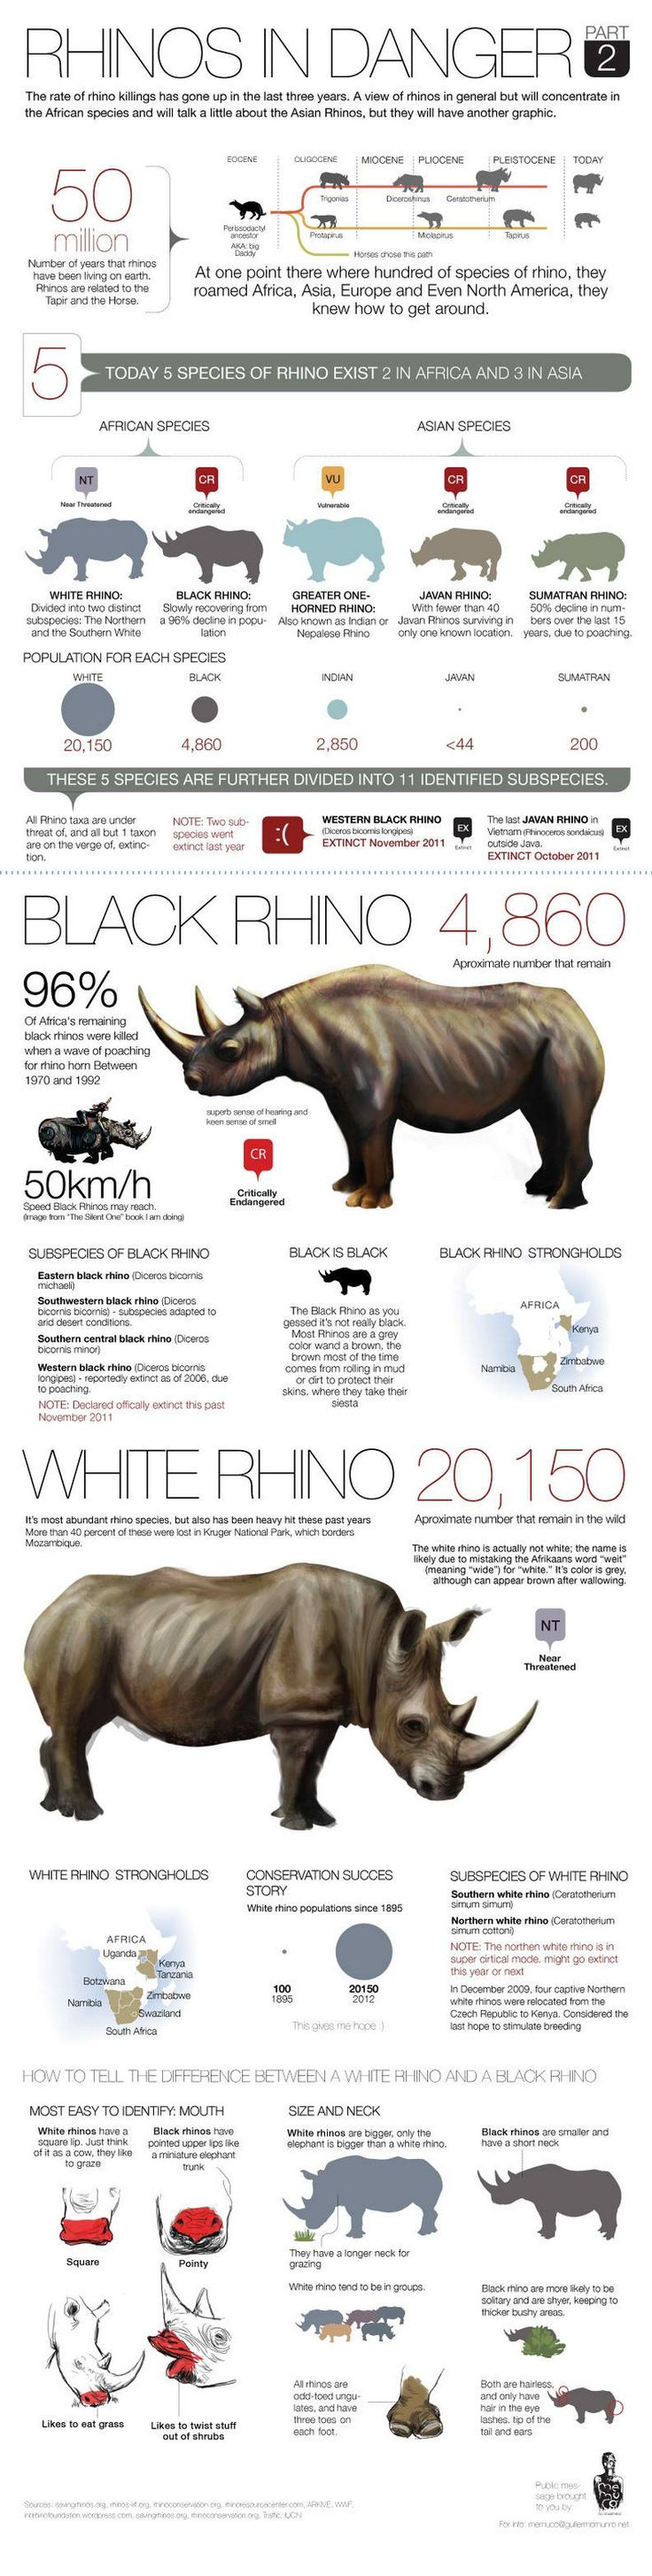 Rhinos en part2 peligro